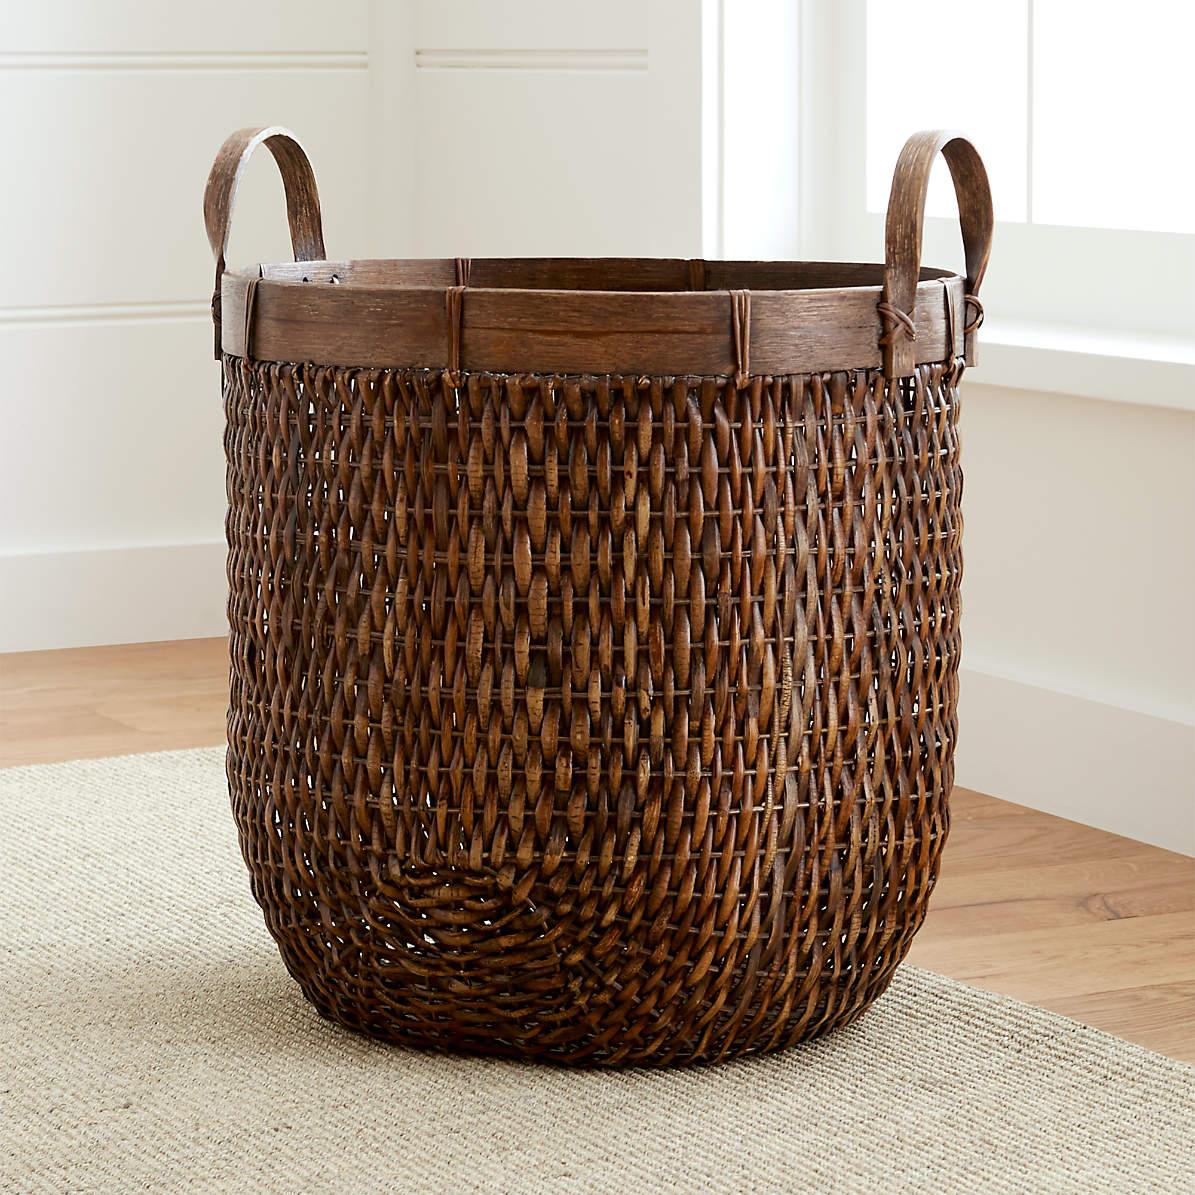 Halton Oval Rattan Basket Tall Reviews Crate And Barrel